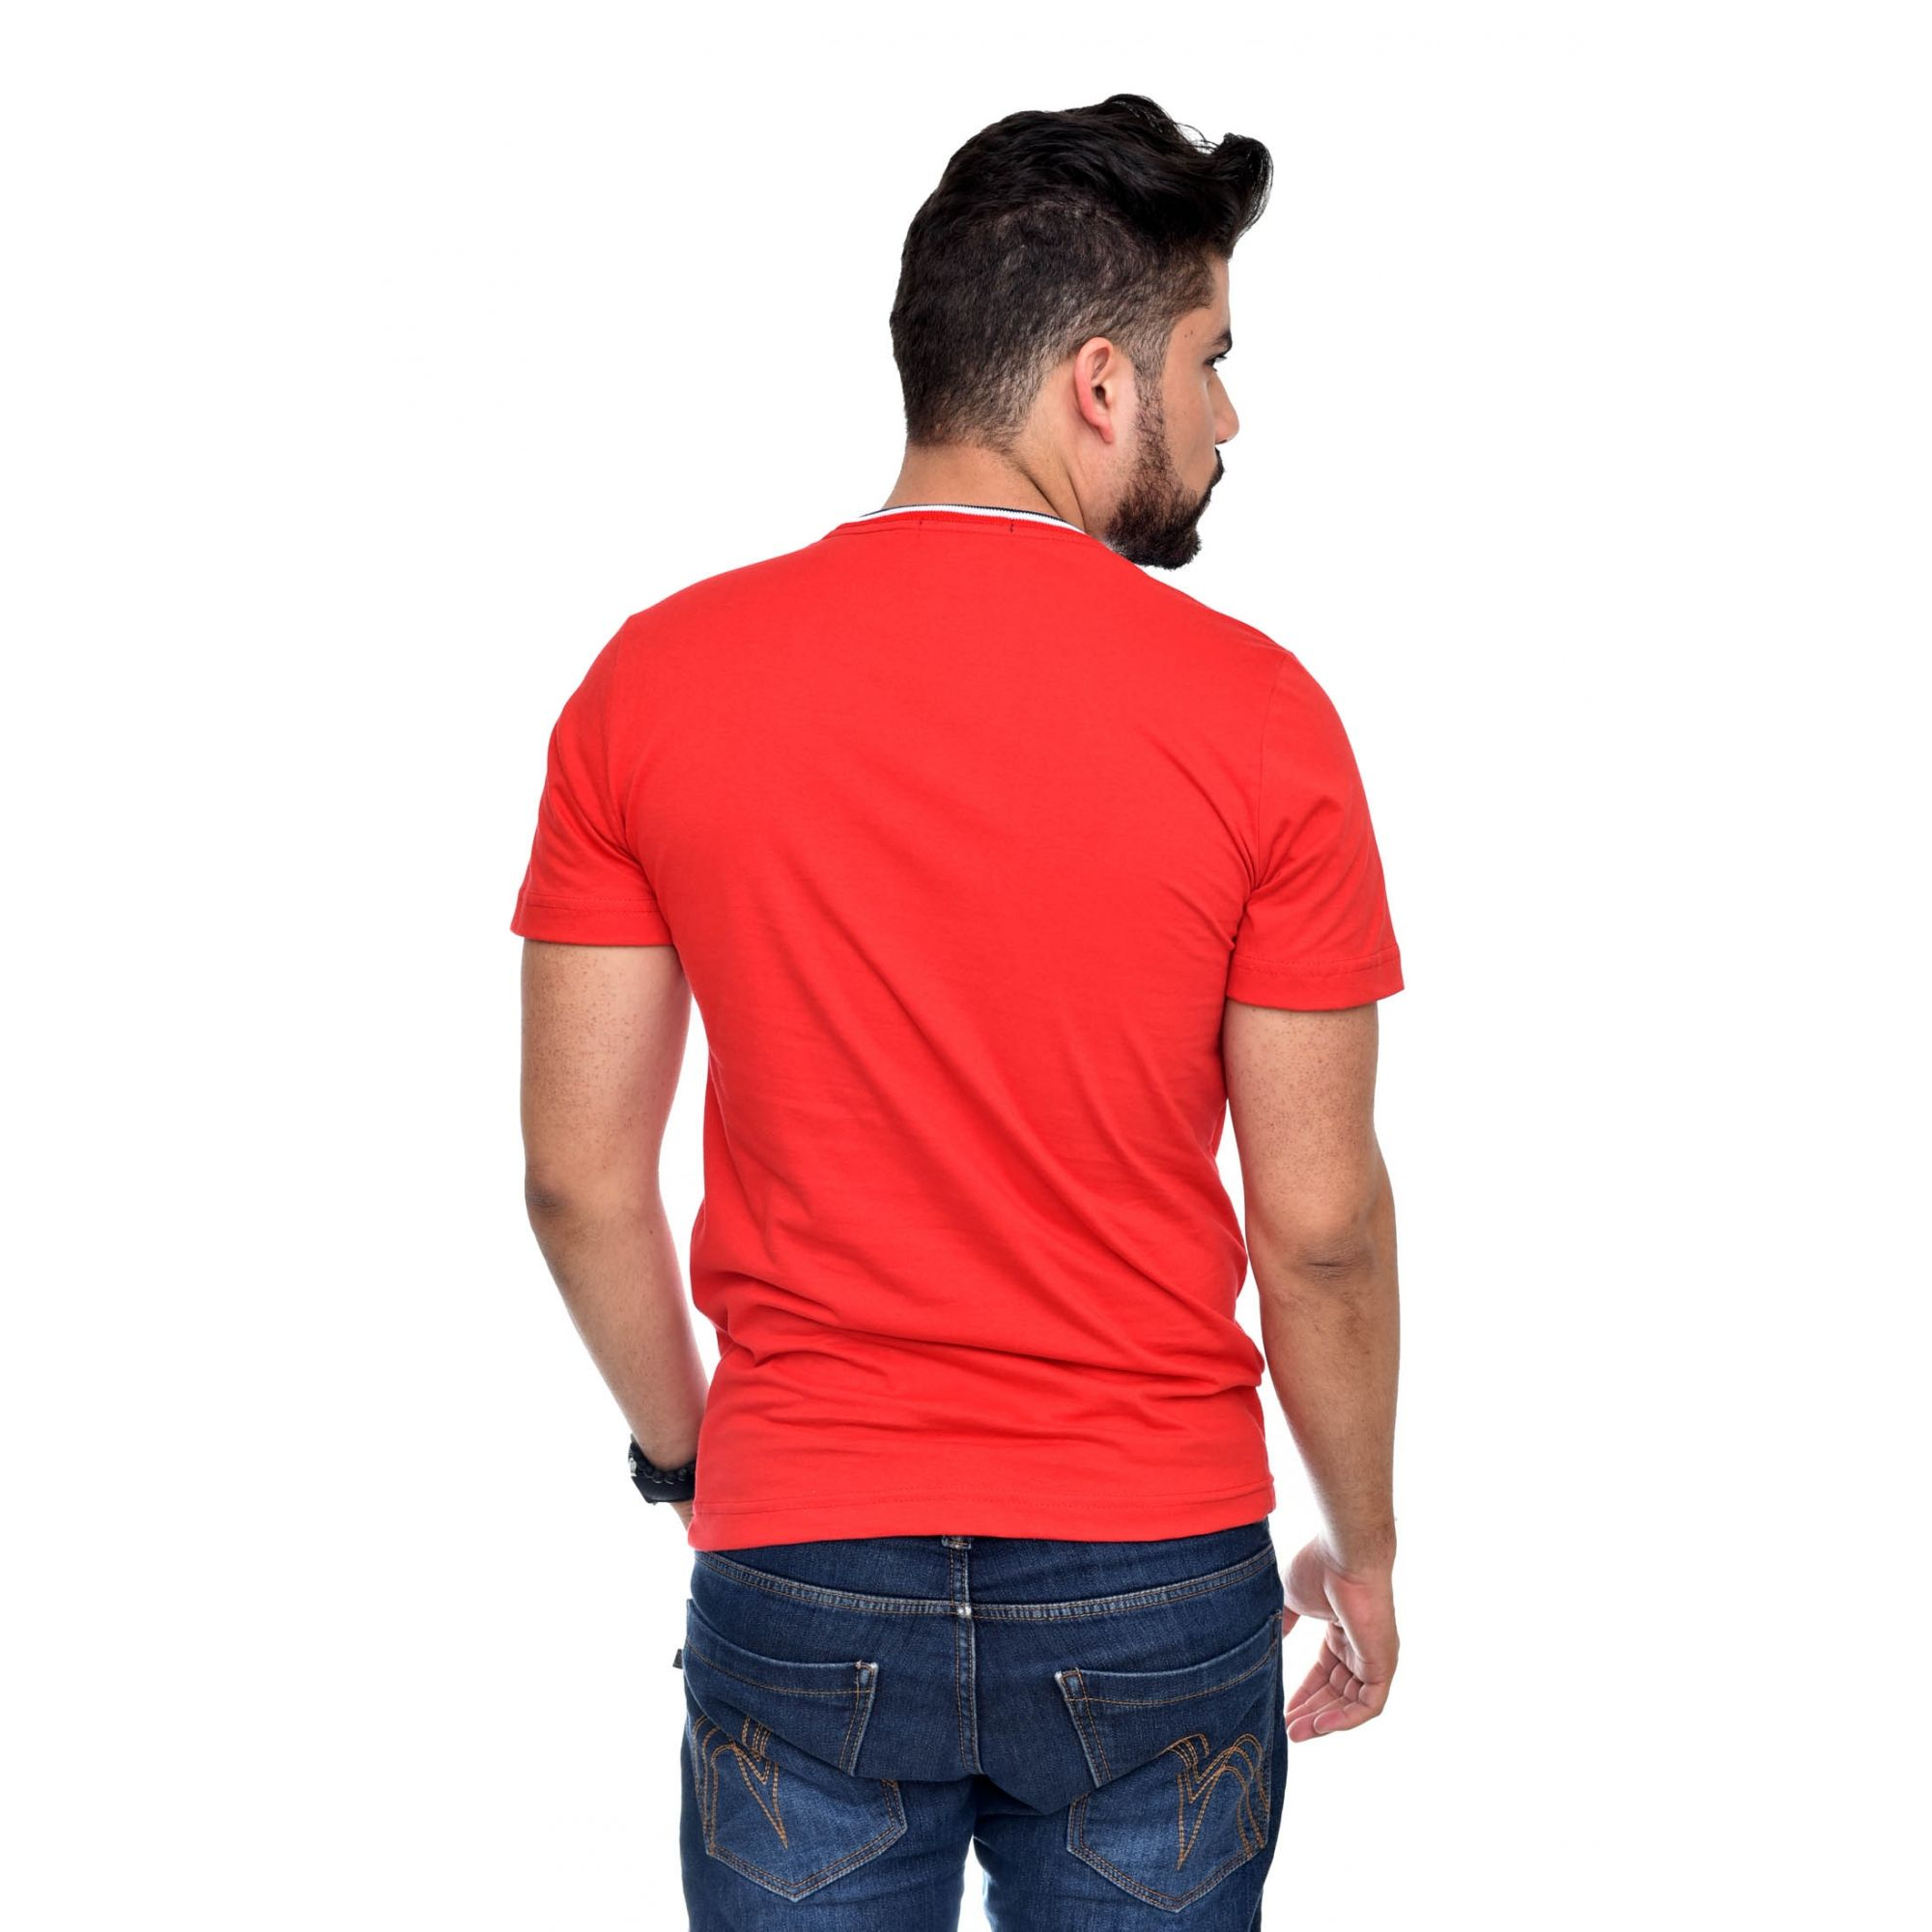 Camiseta RL Vermelha TR  - Ca Brasileira